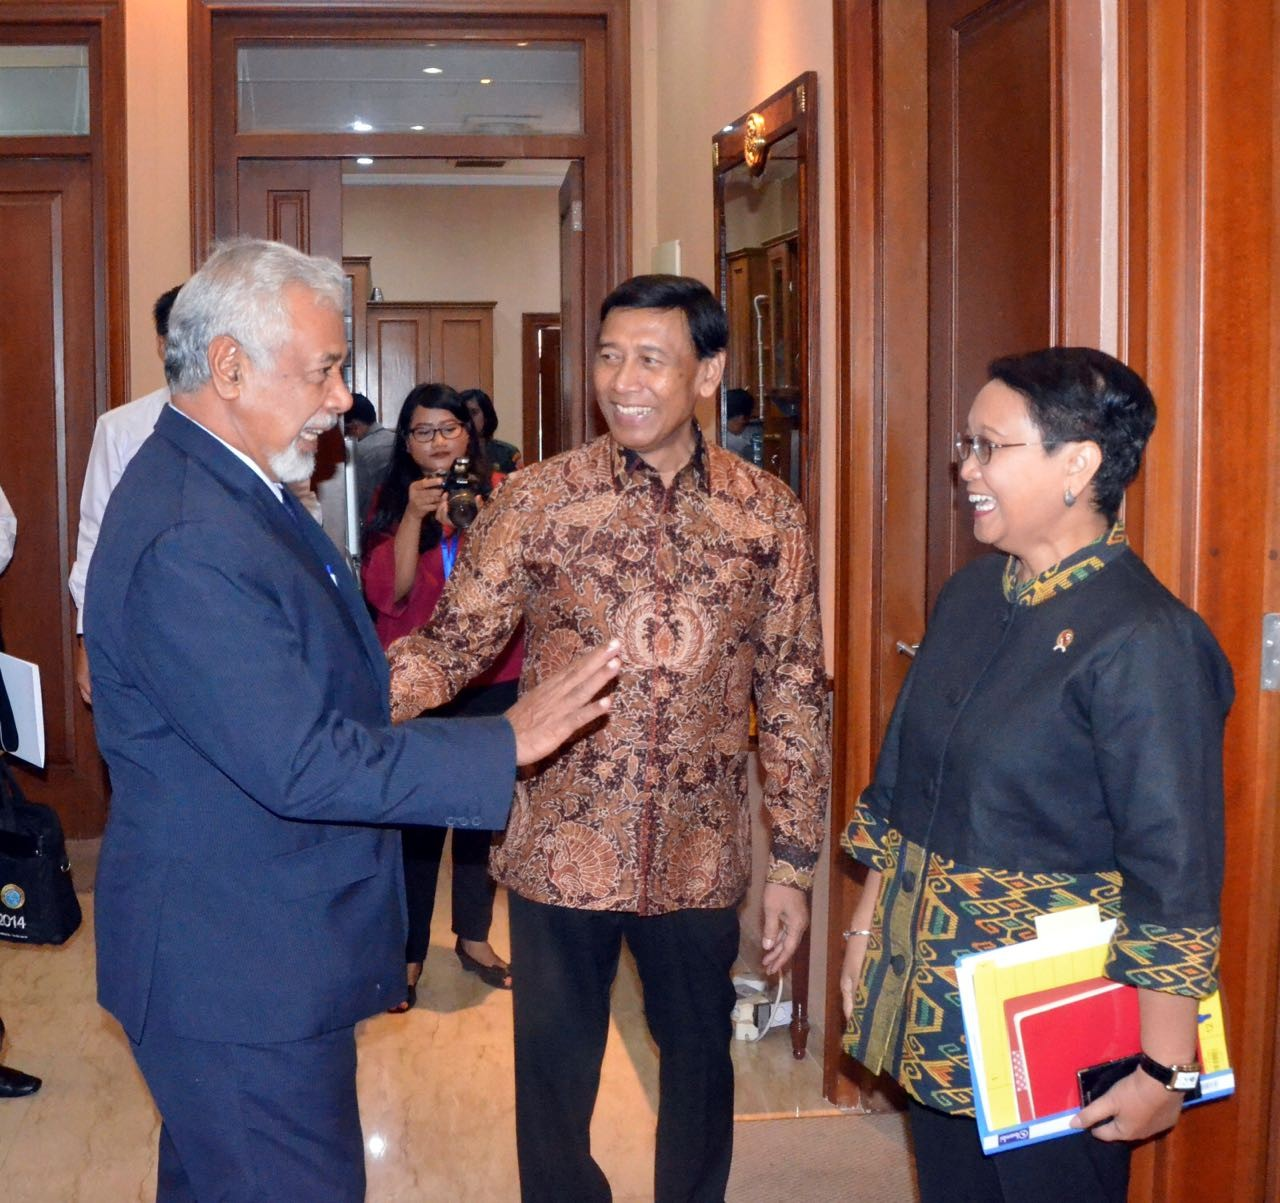 Jokowi's Australia visit back on track after tensions ease